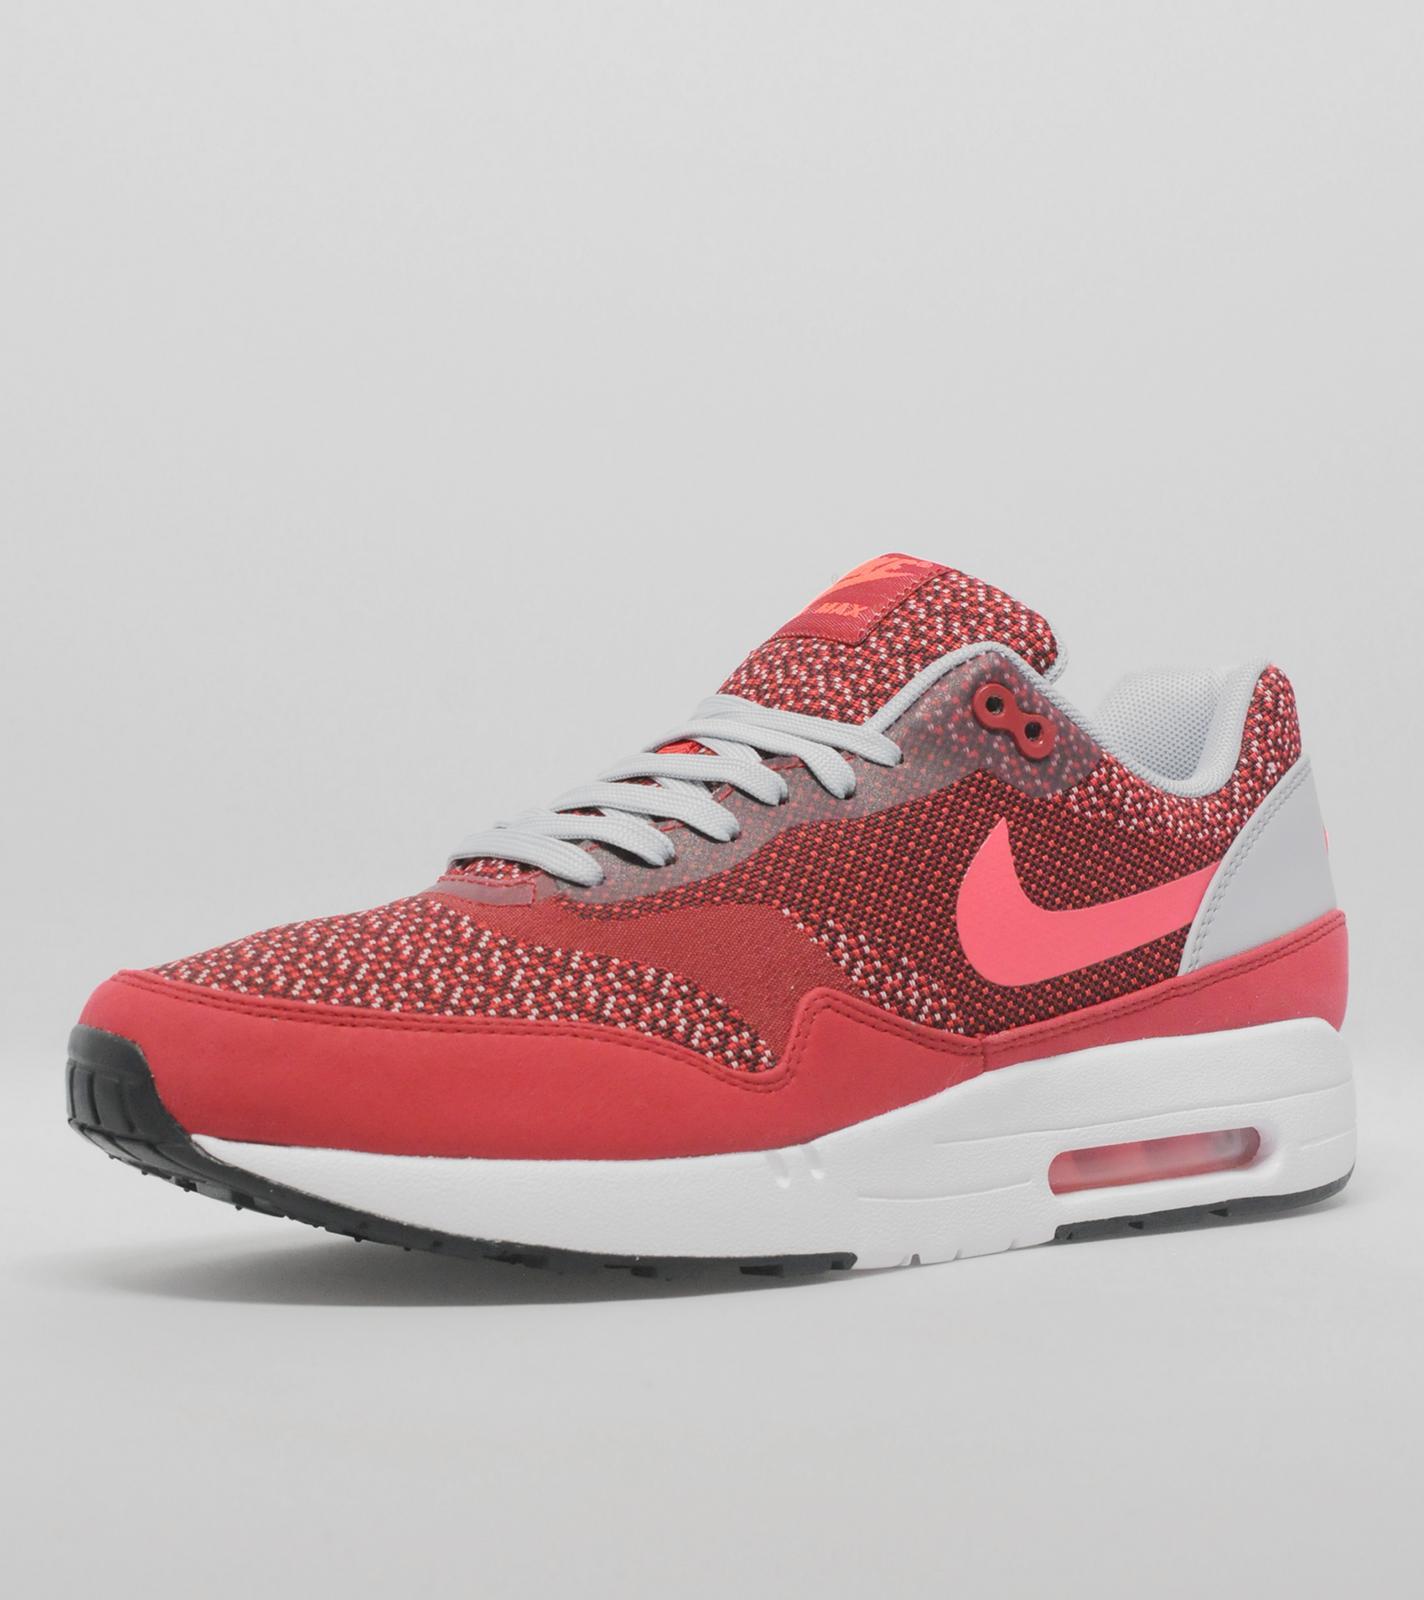 Nike Air Max 1 Jacquard   Size?